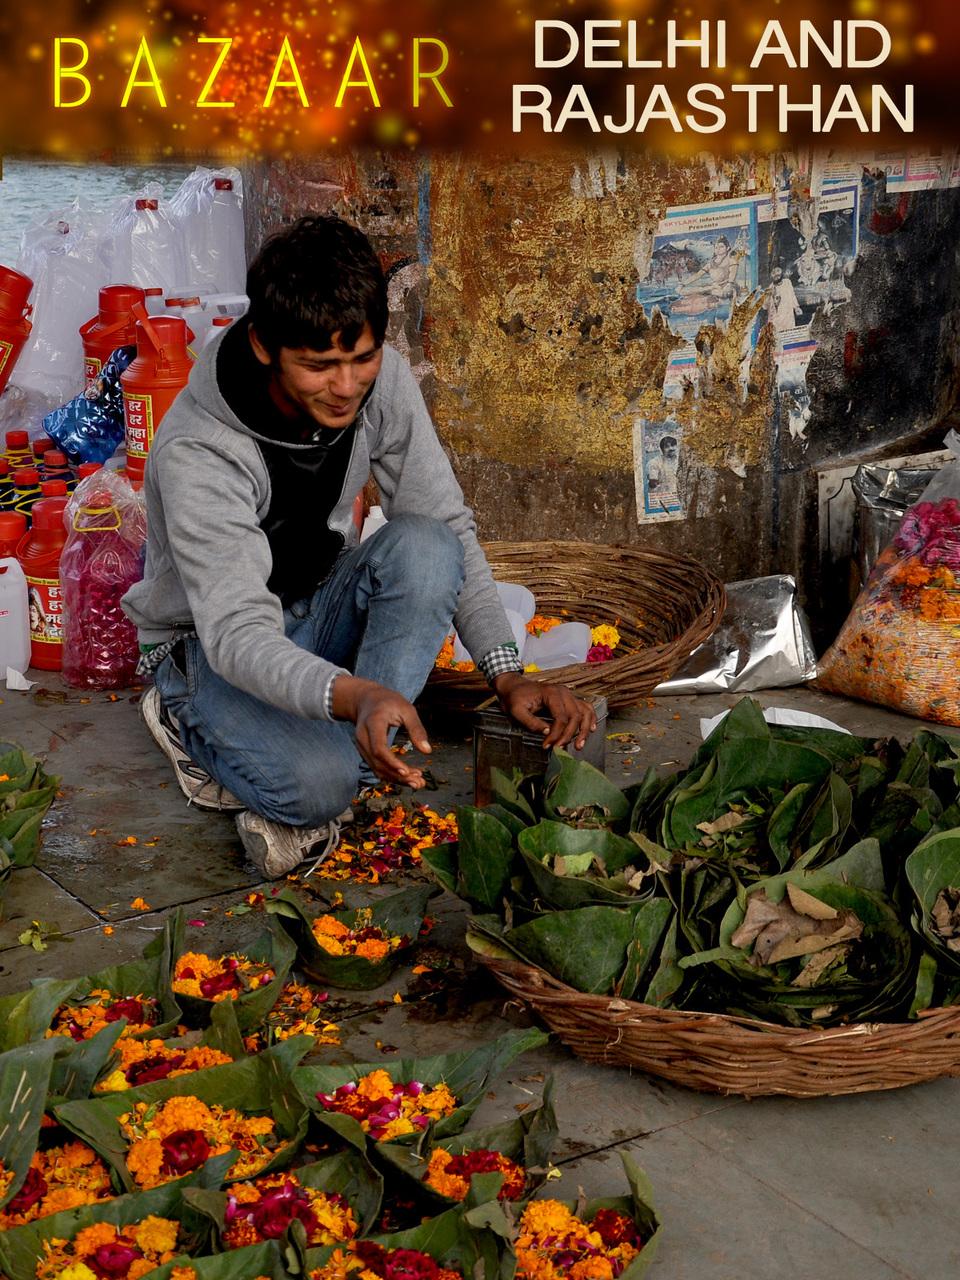 Bazaar Delhi (Digital Download)